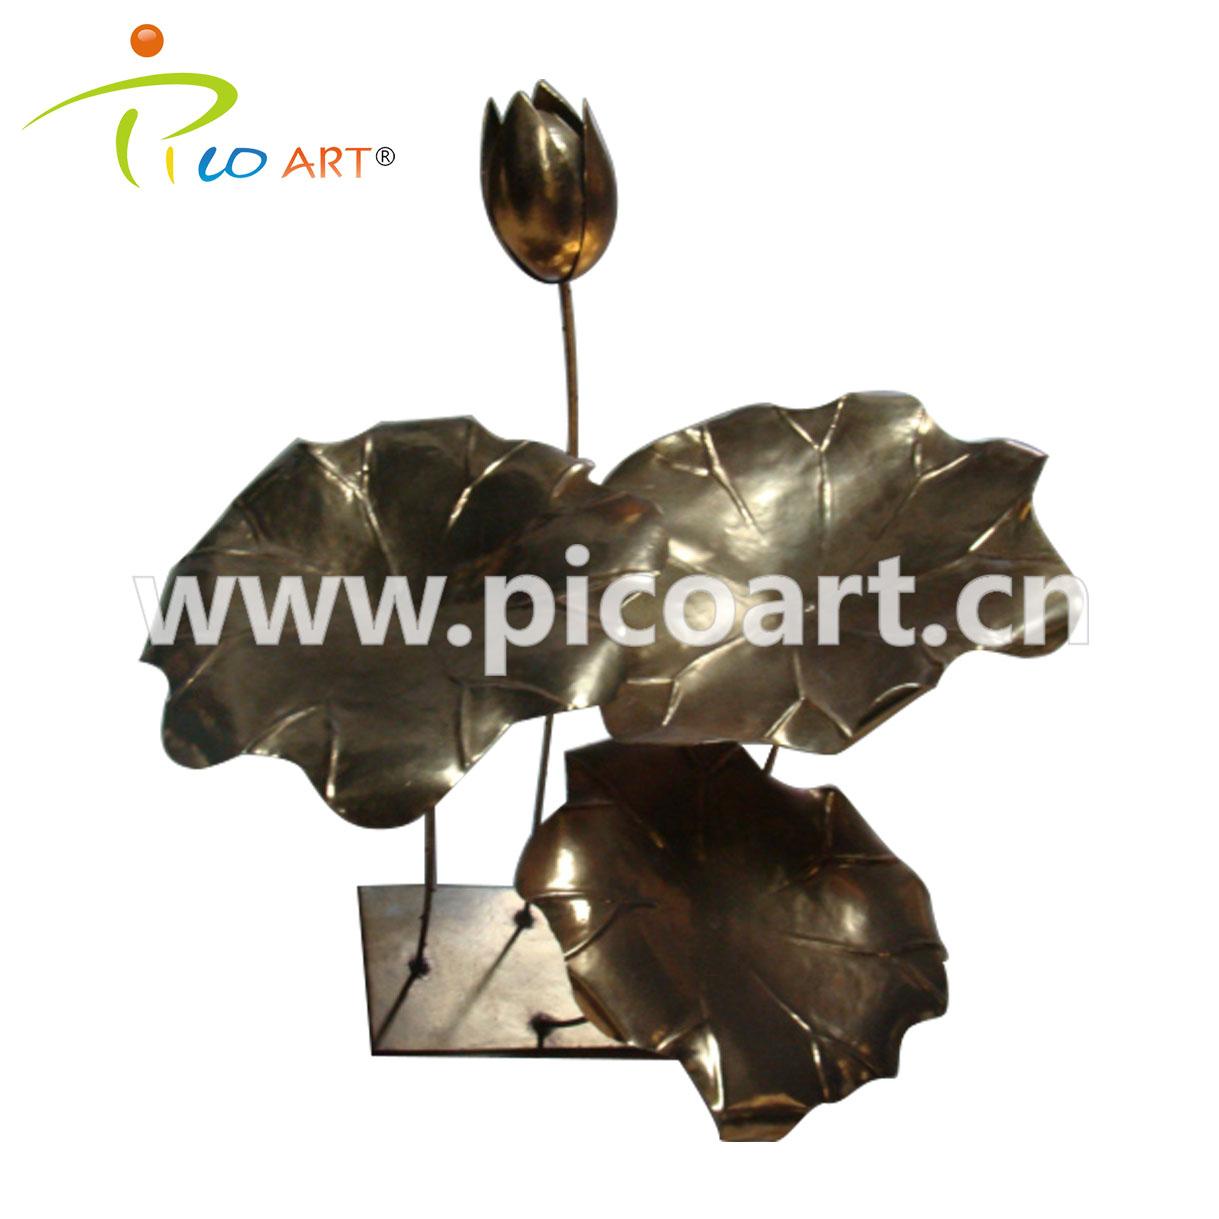 Lotus Cast Iron Steel Scrap Artwork Sculptures for Indoor Decorative Furnishing